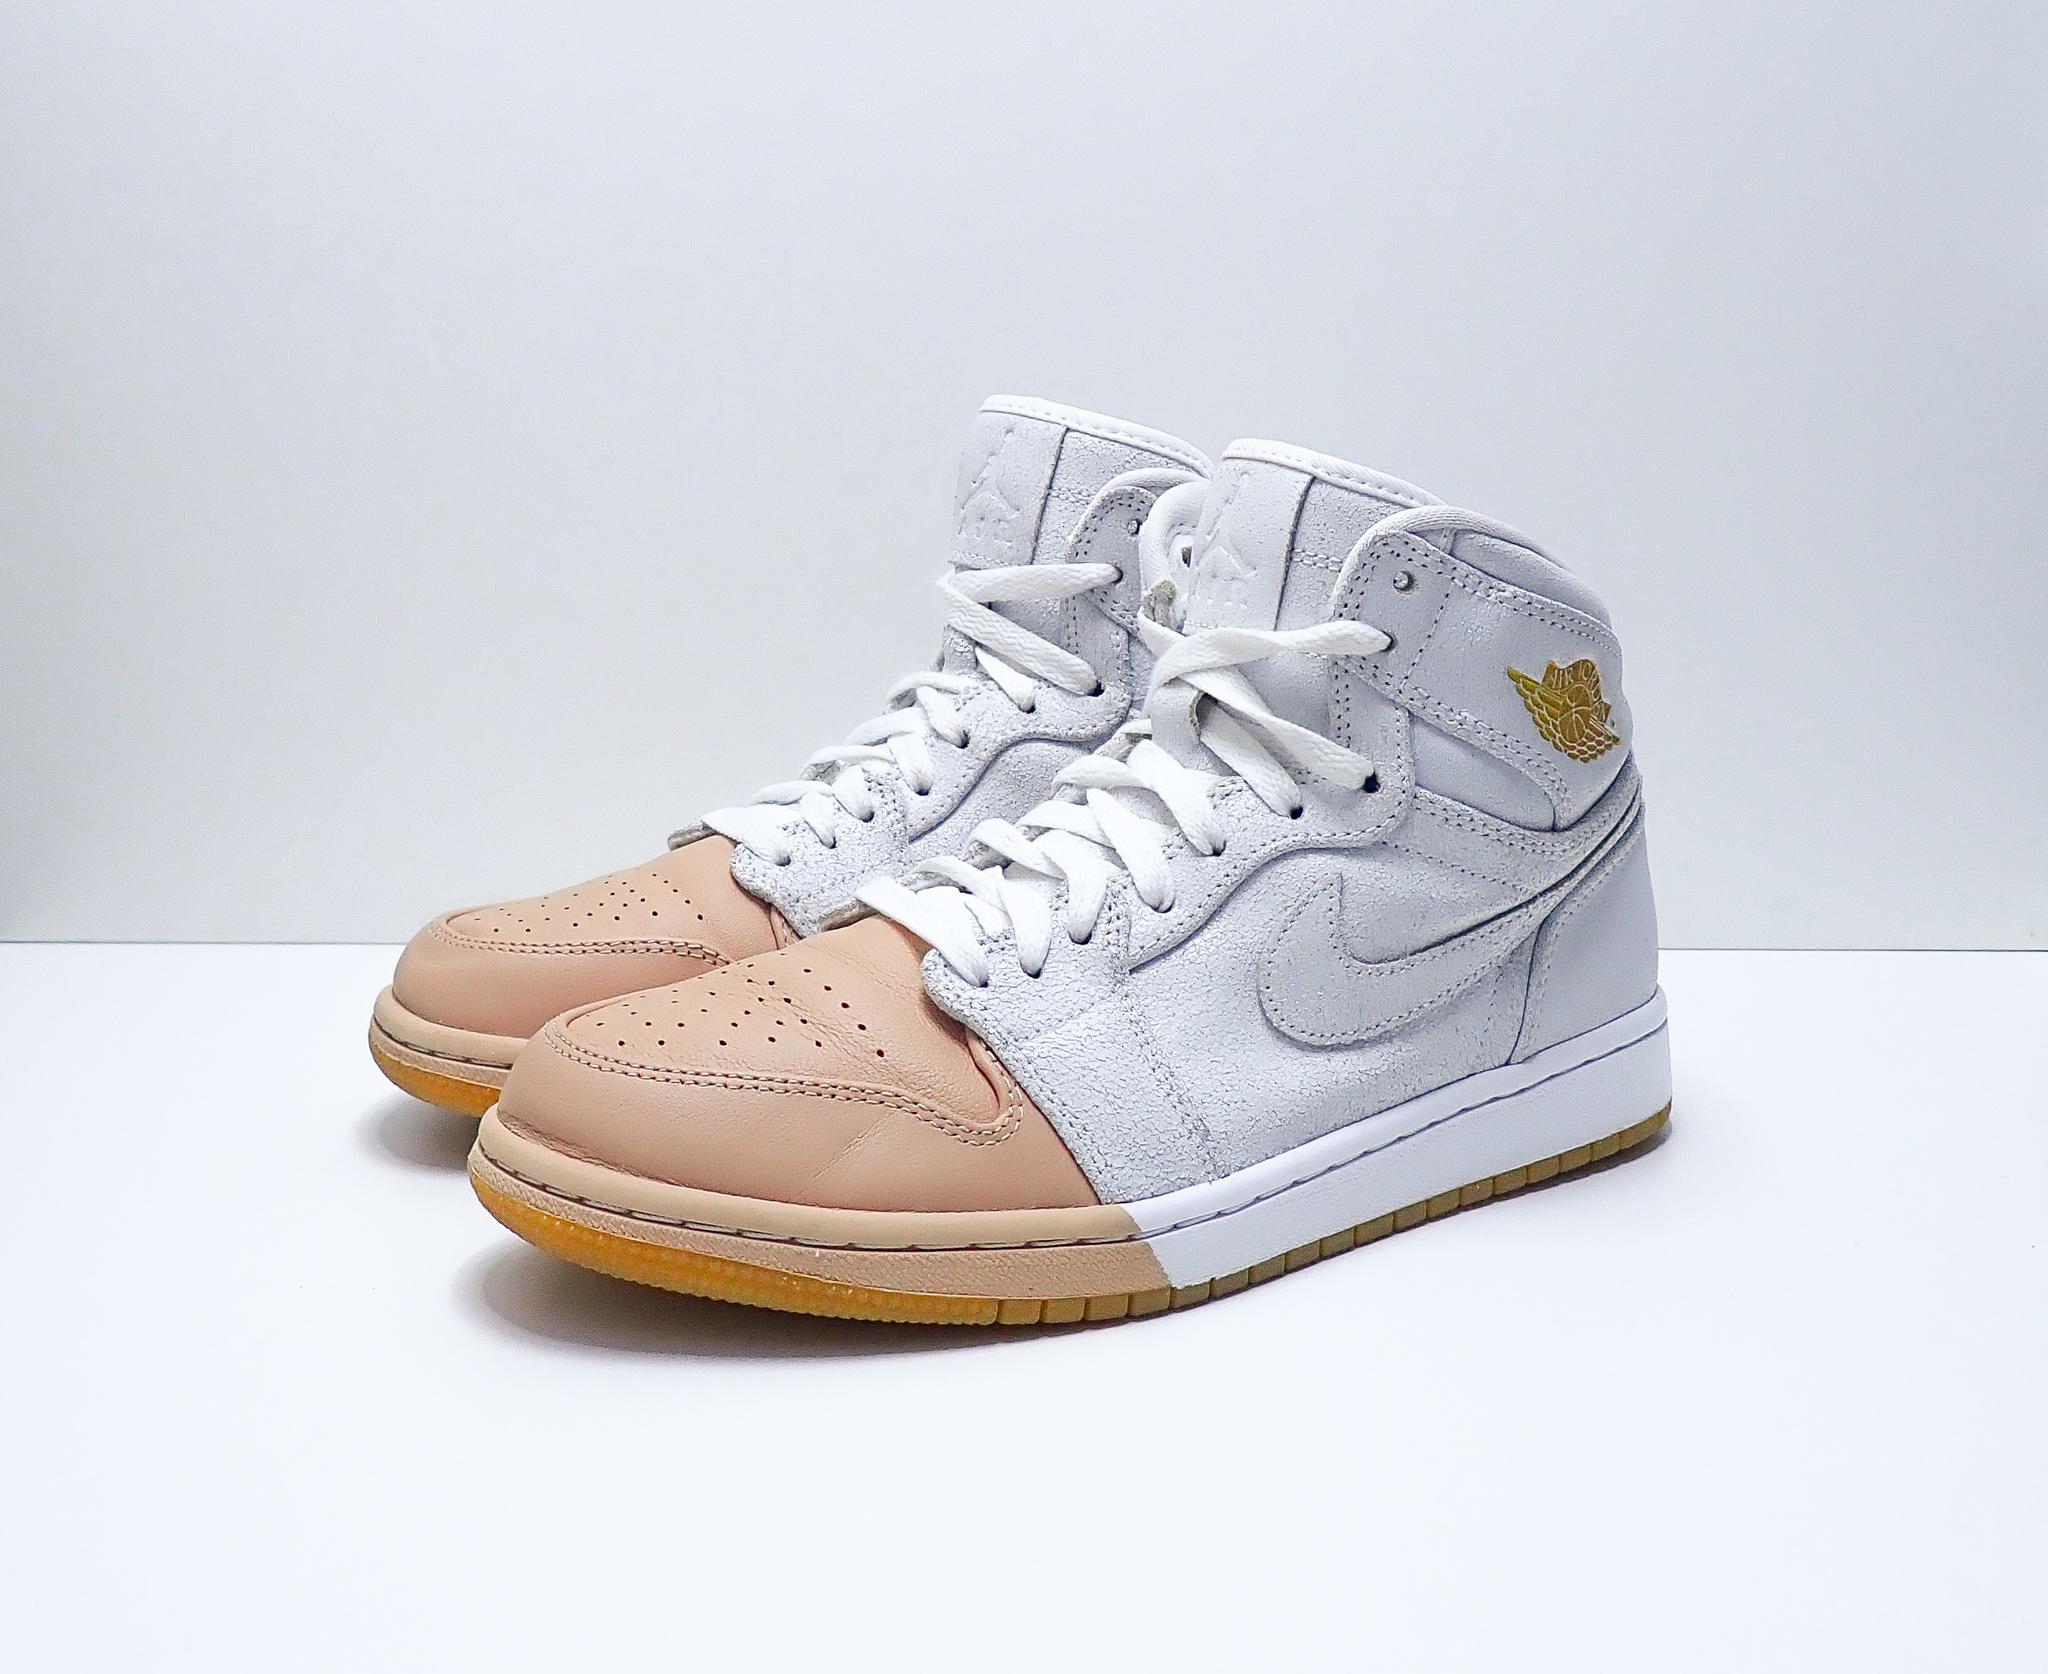 Jordan 1 W Retro High Dip-Toe White